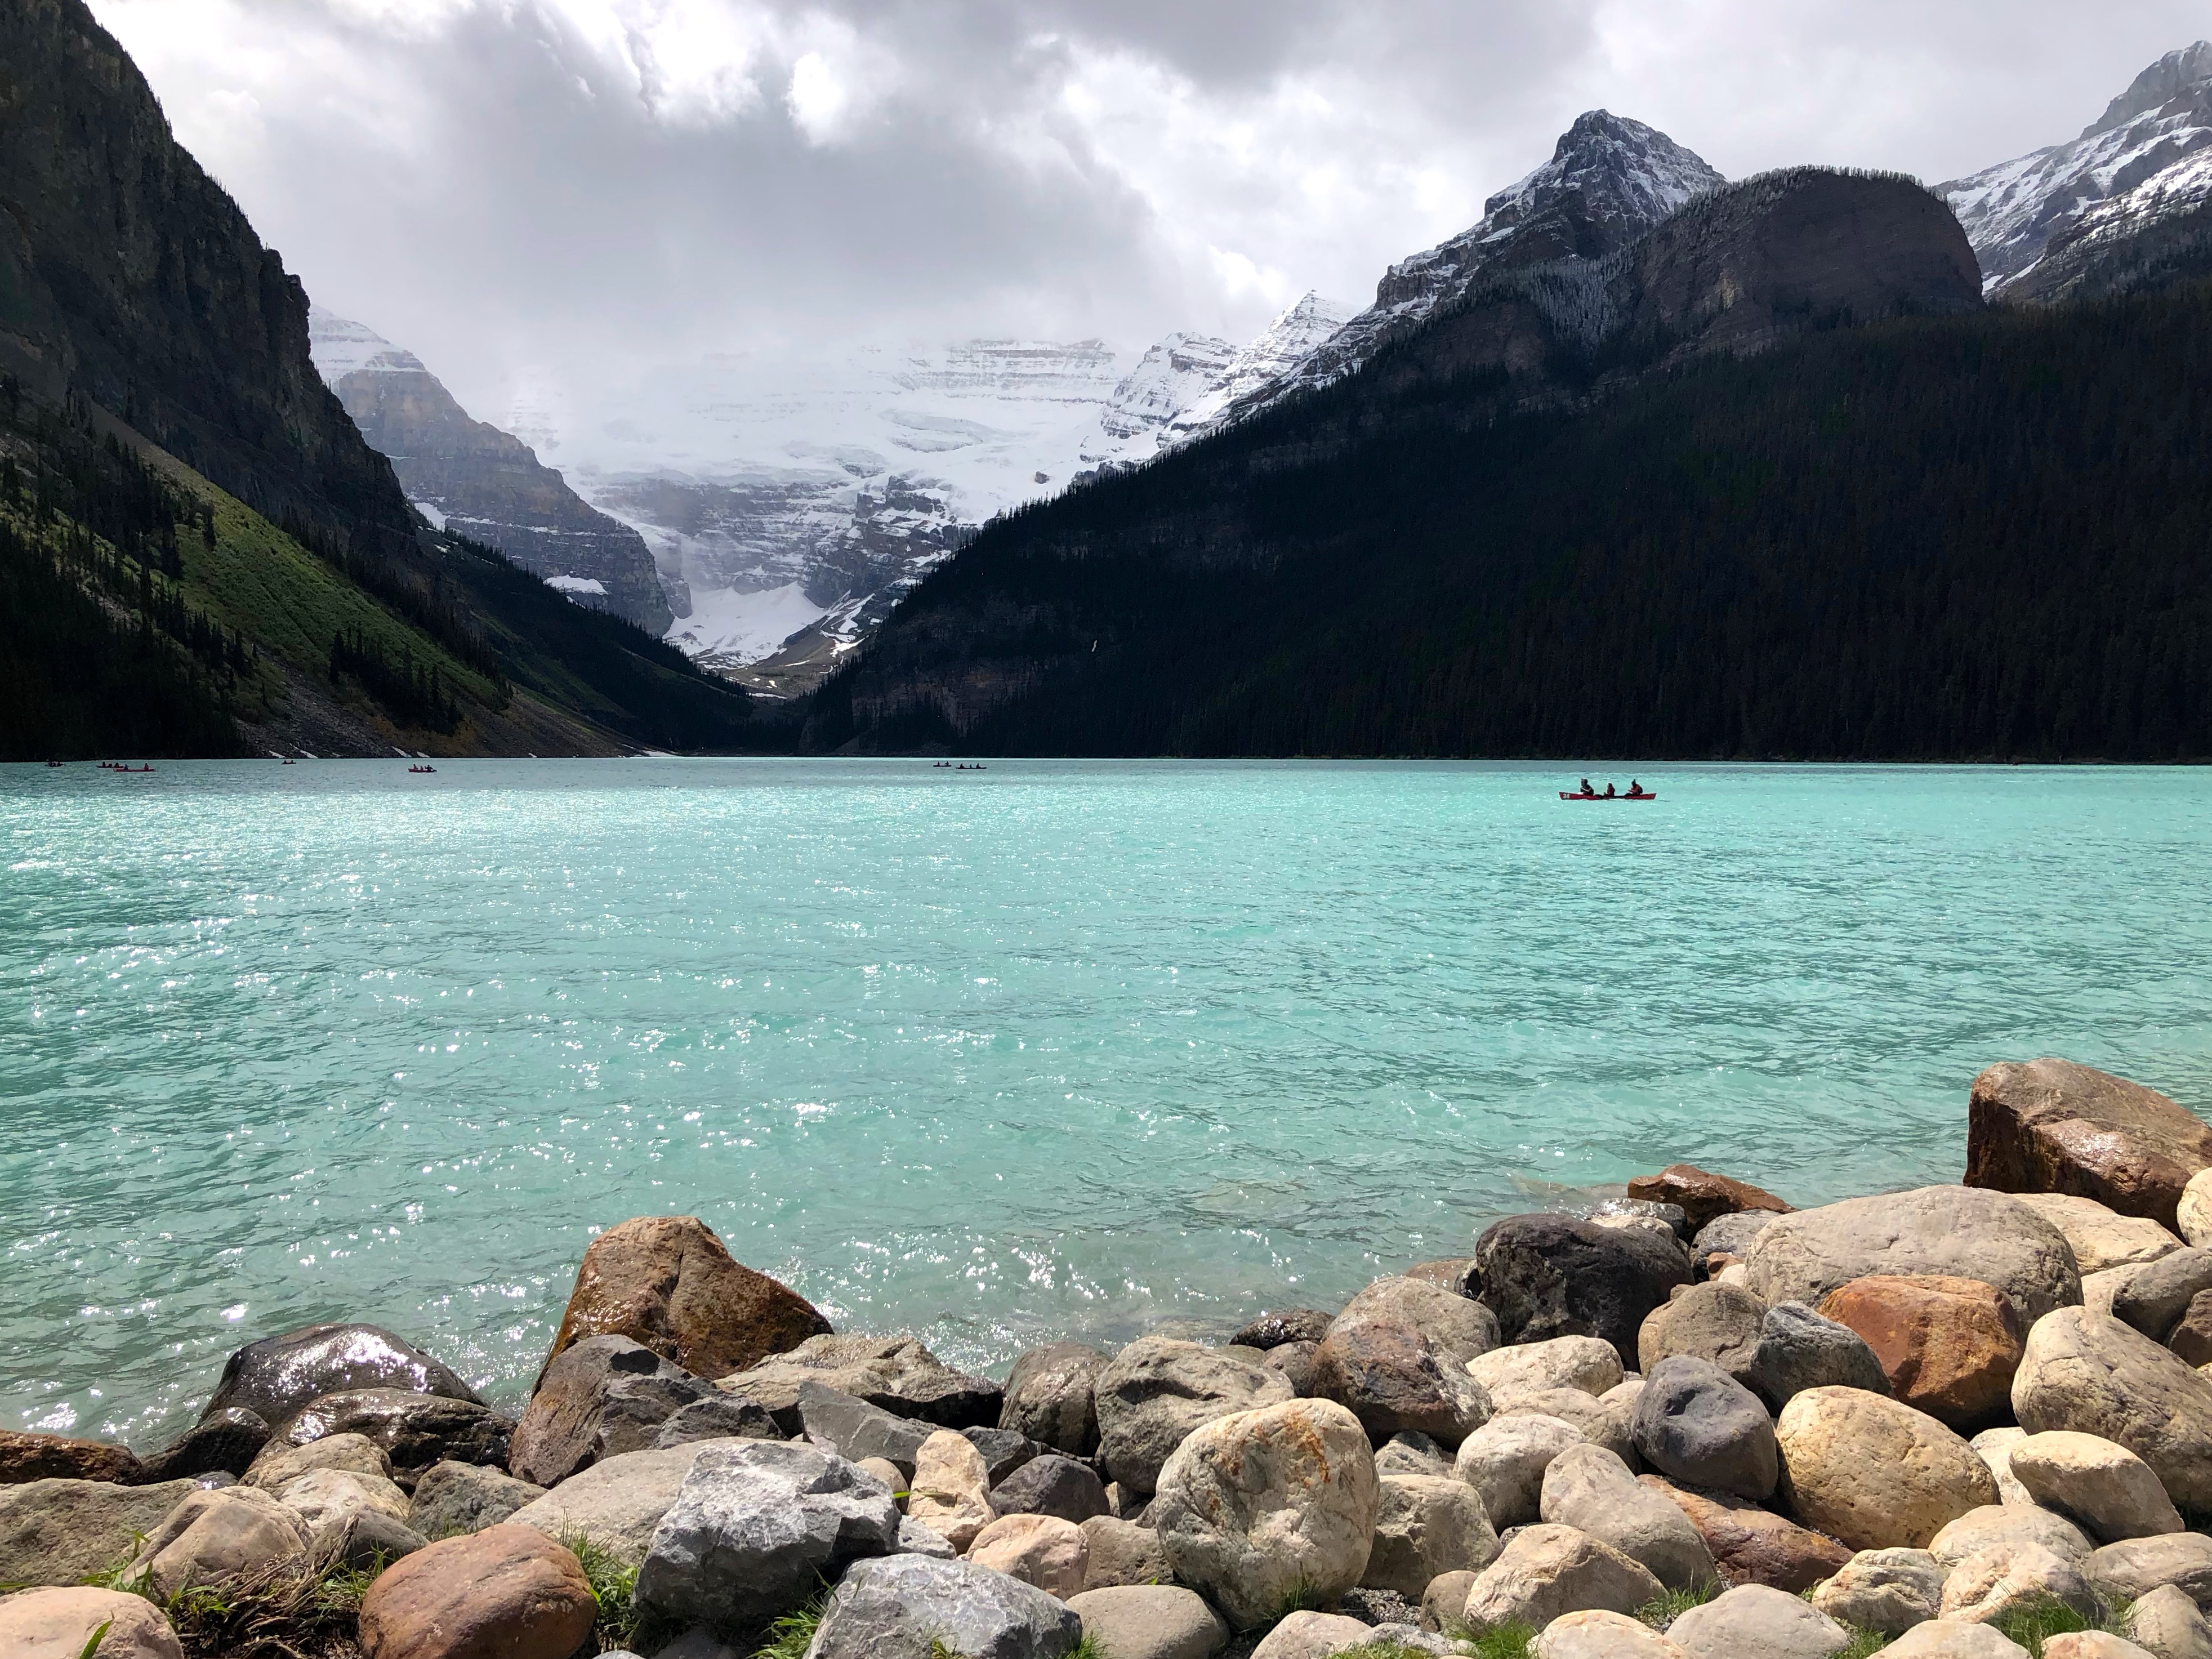 Canada Rockies TrekAmerica Itrekhere 2018 128